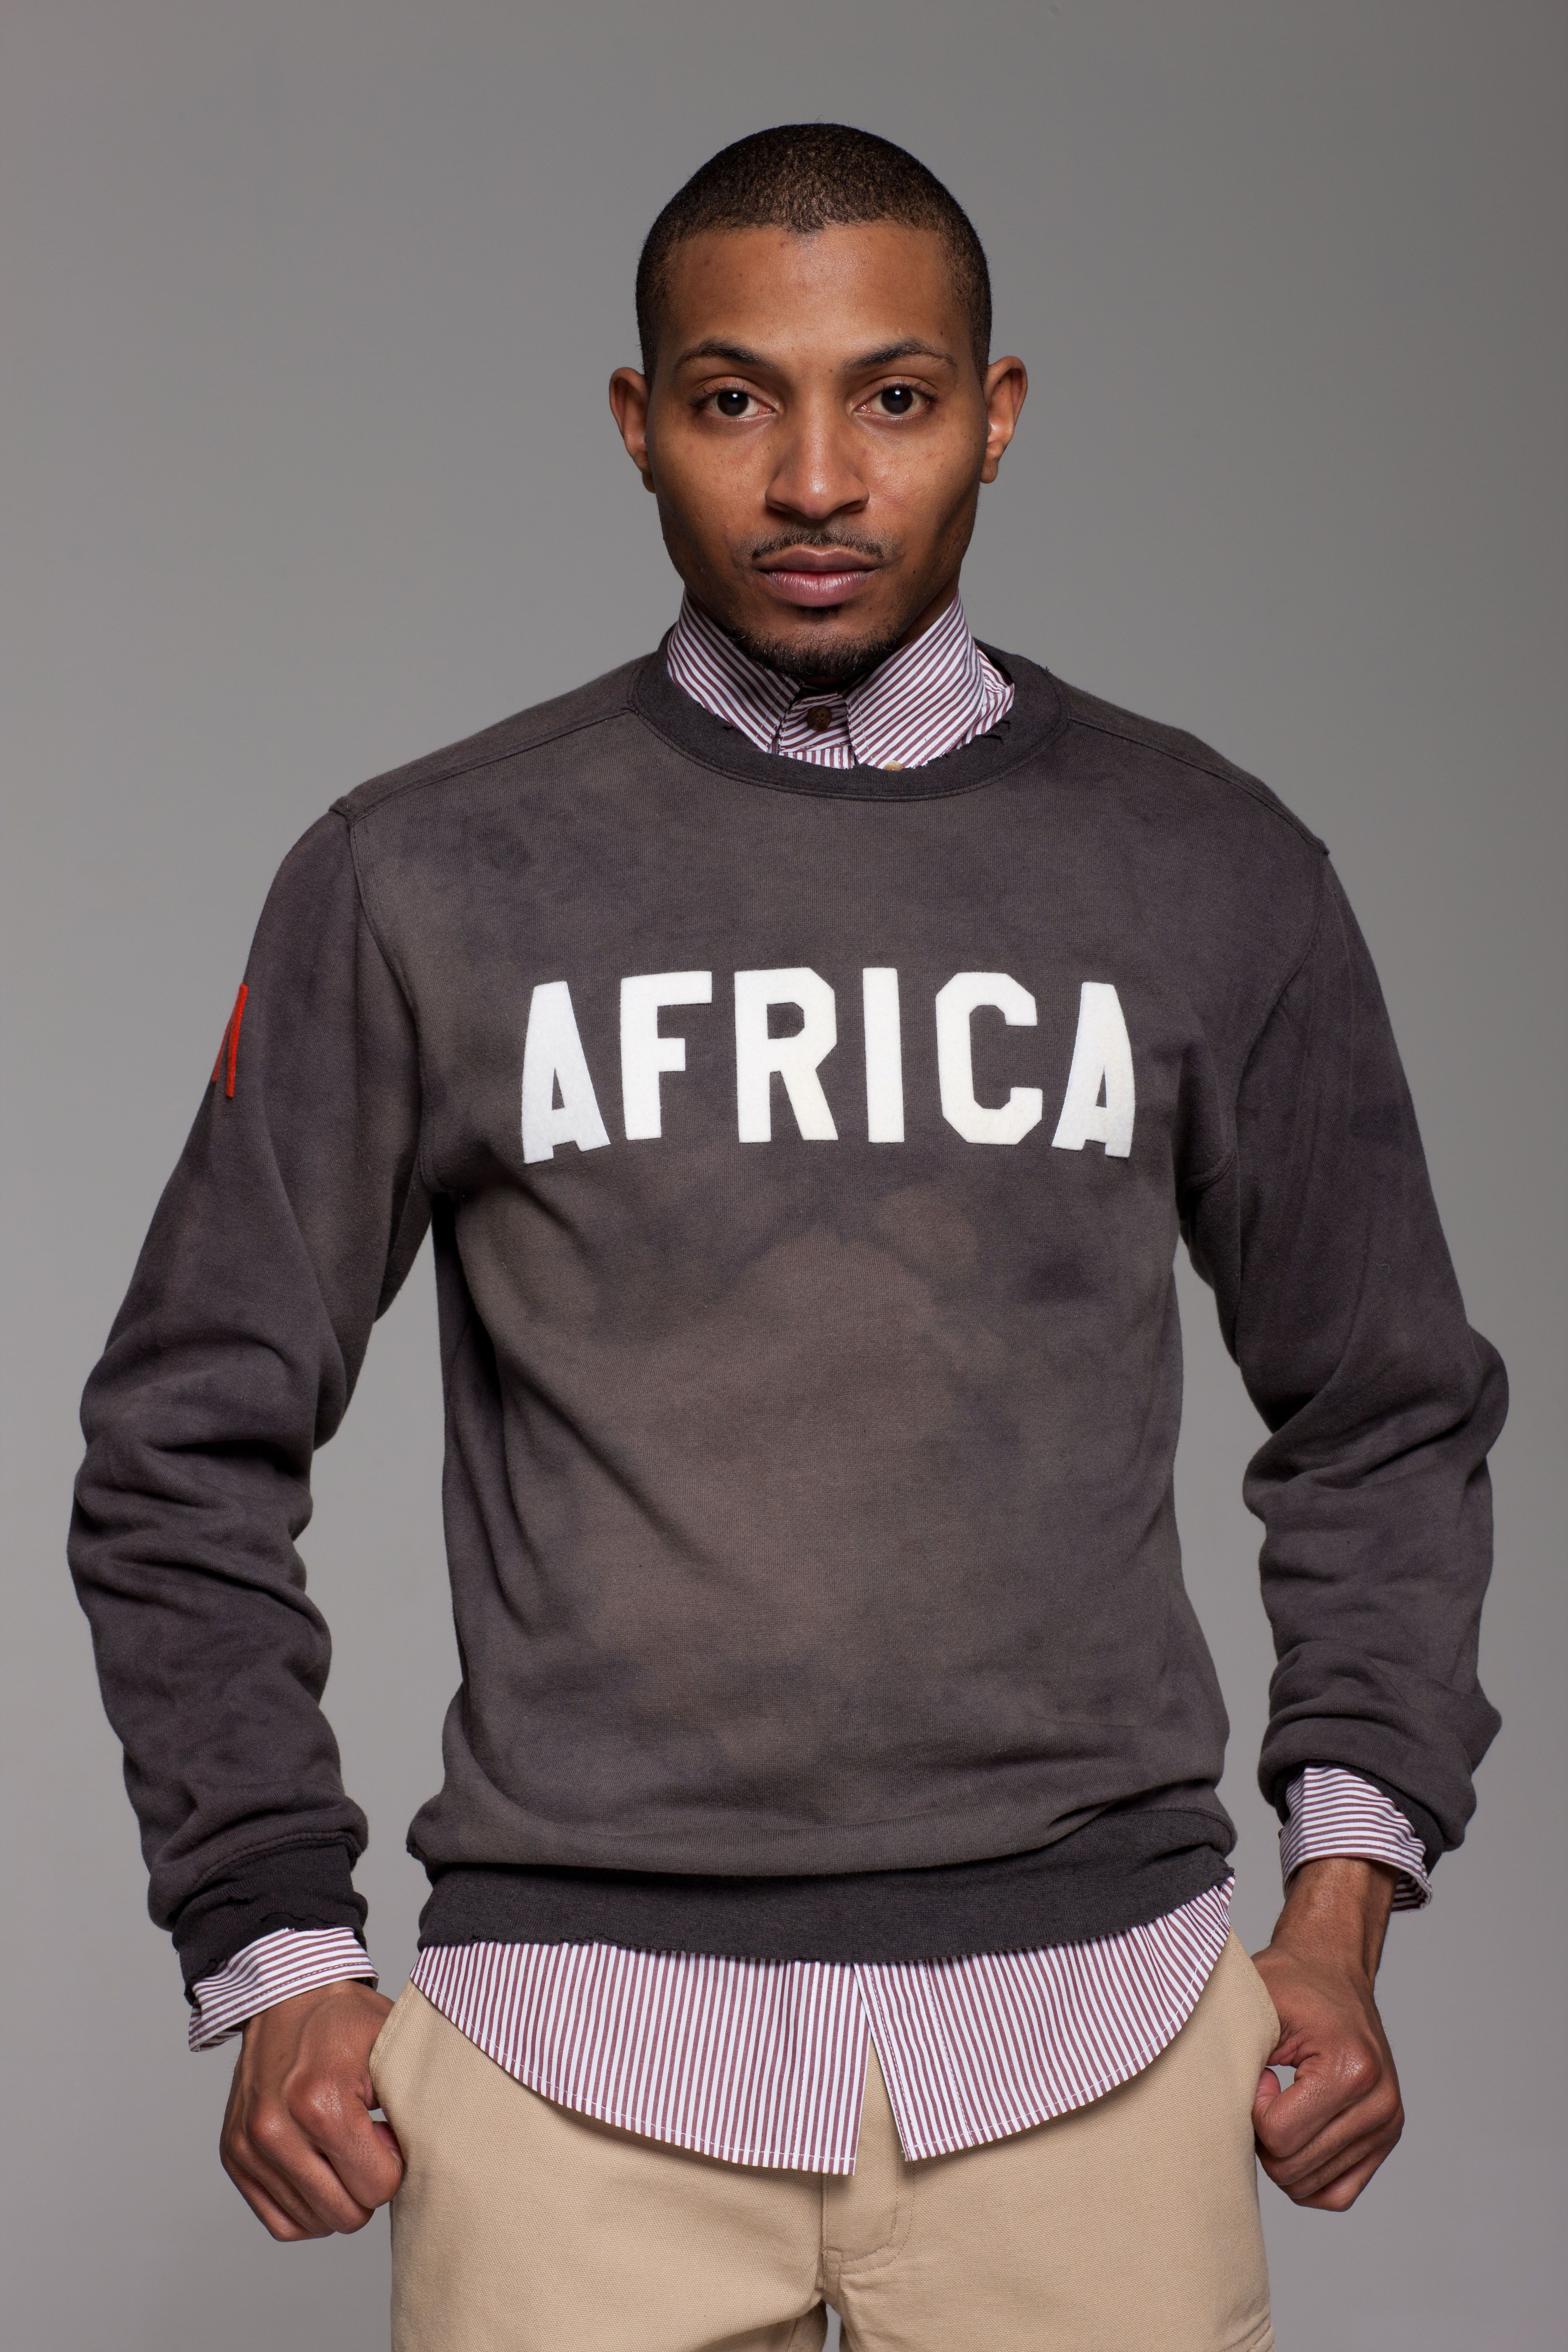 Africa Crewneck Striped Button Up Long Sleeve Tshirt Men Sweatshirts Mens Tops [ 5616 x 3744 Pixel ]